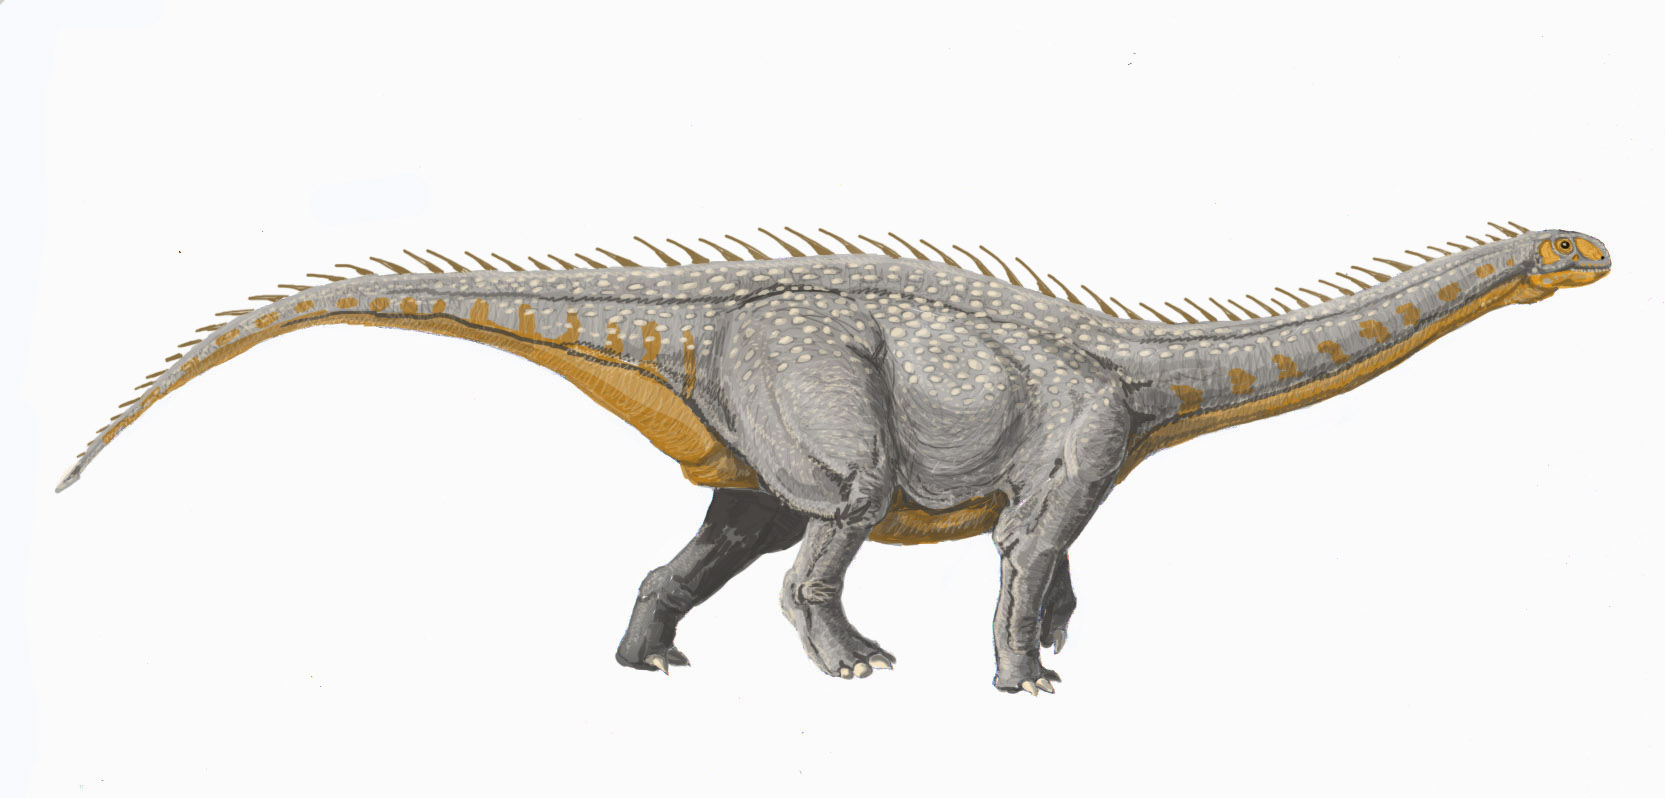 barapasaurus - photo #6